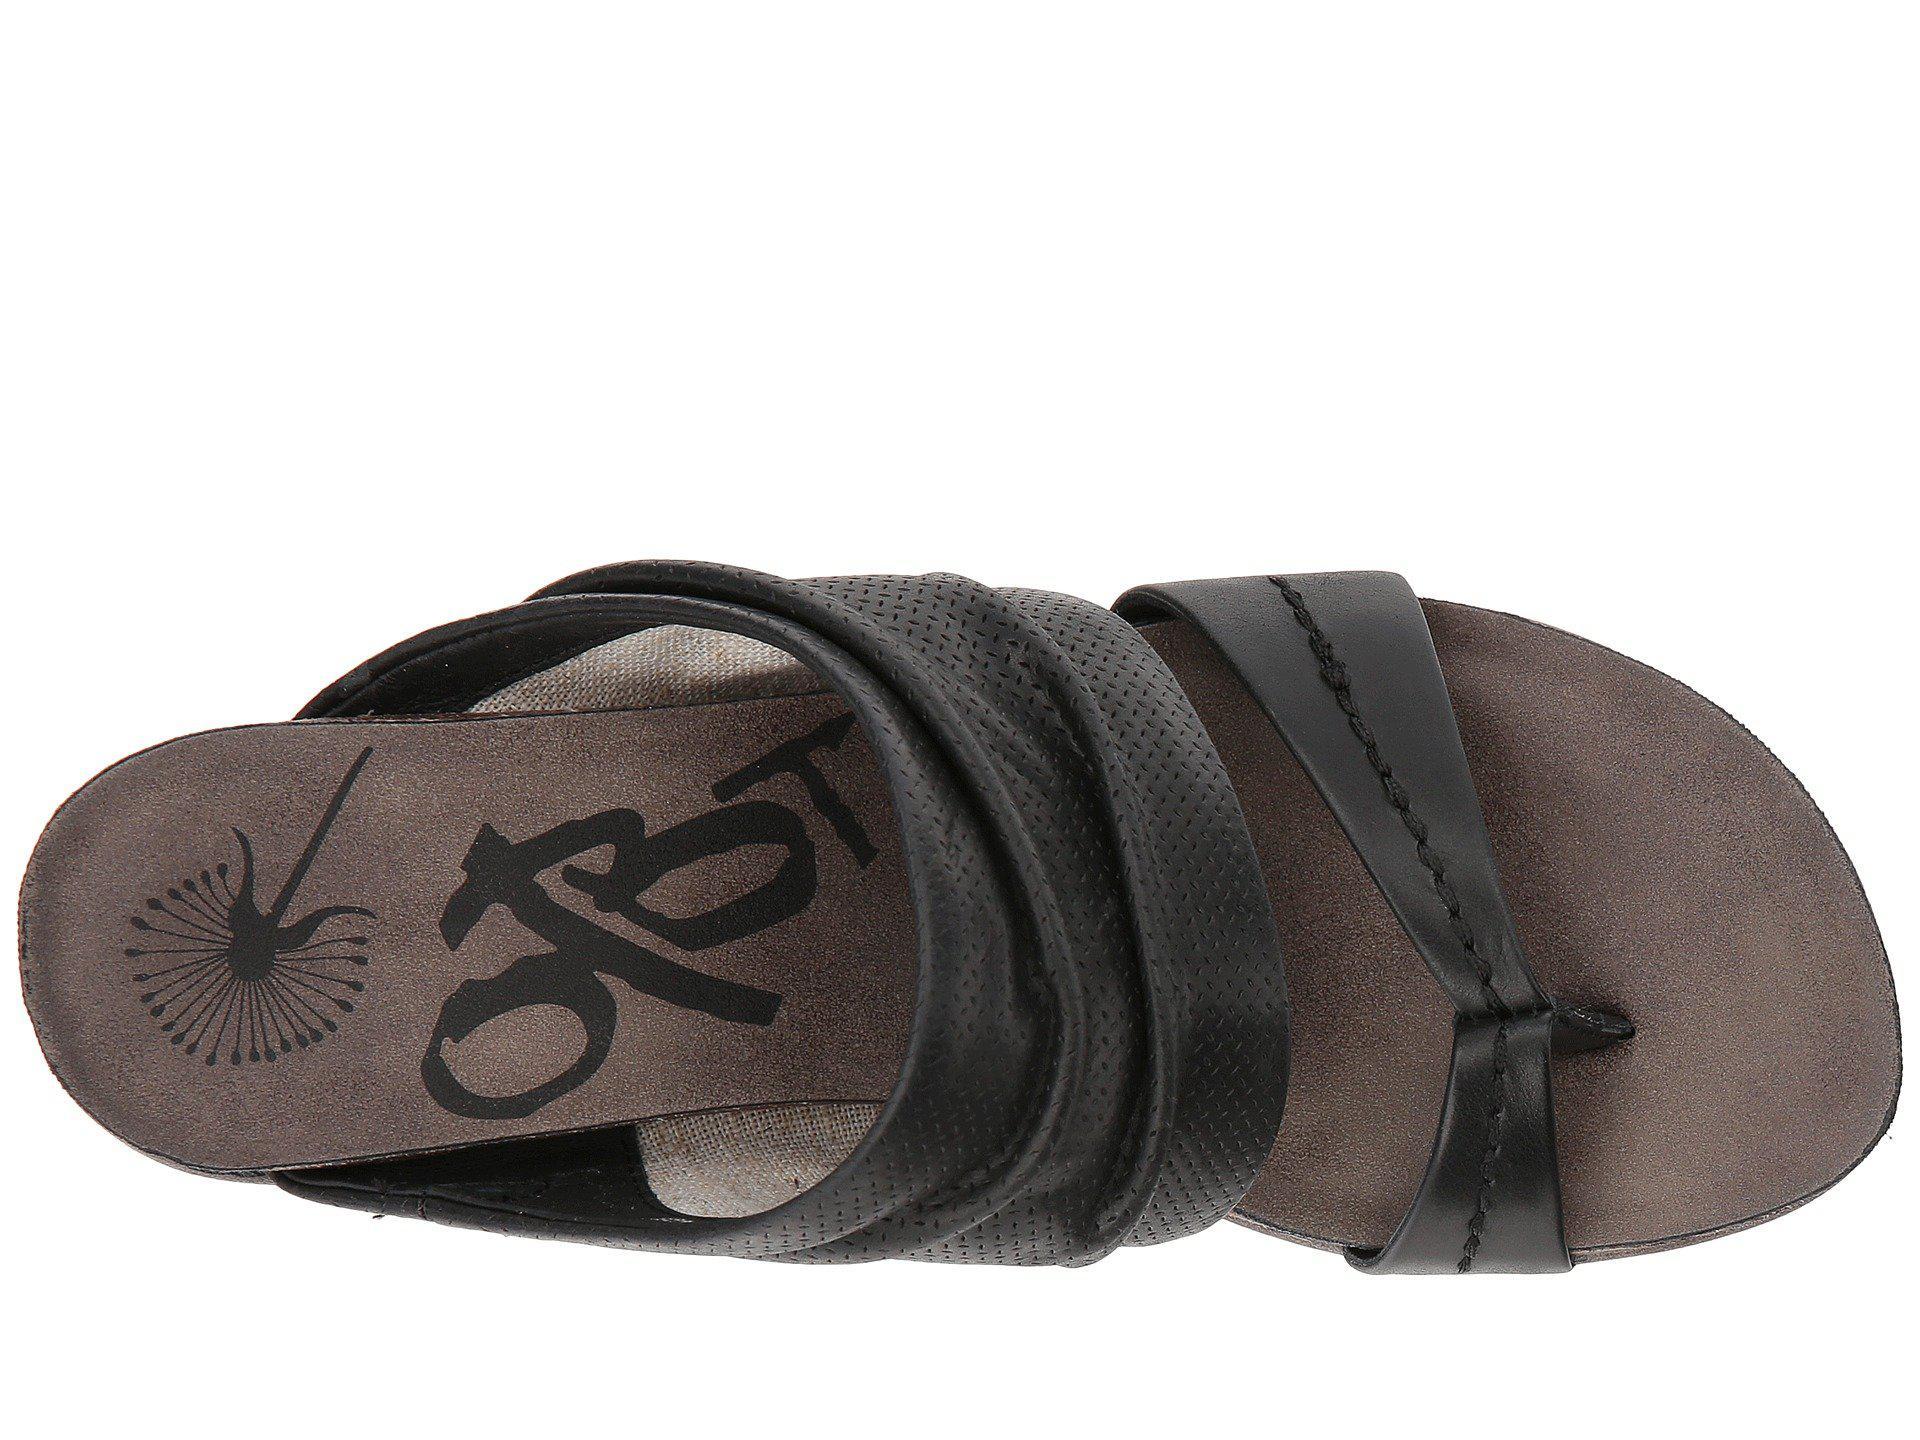 0a2fc91994e Otbt - Black Tailgate Platform Sandals - Lyst. View fullscreen